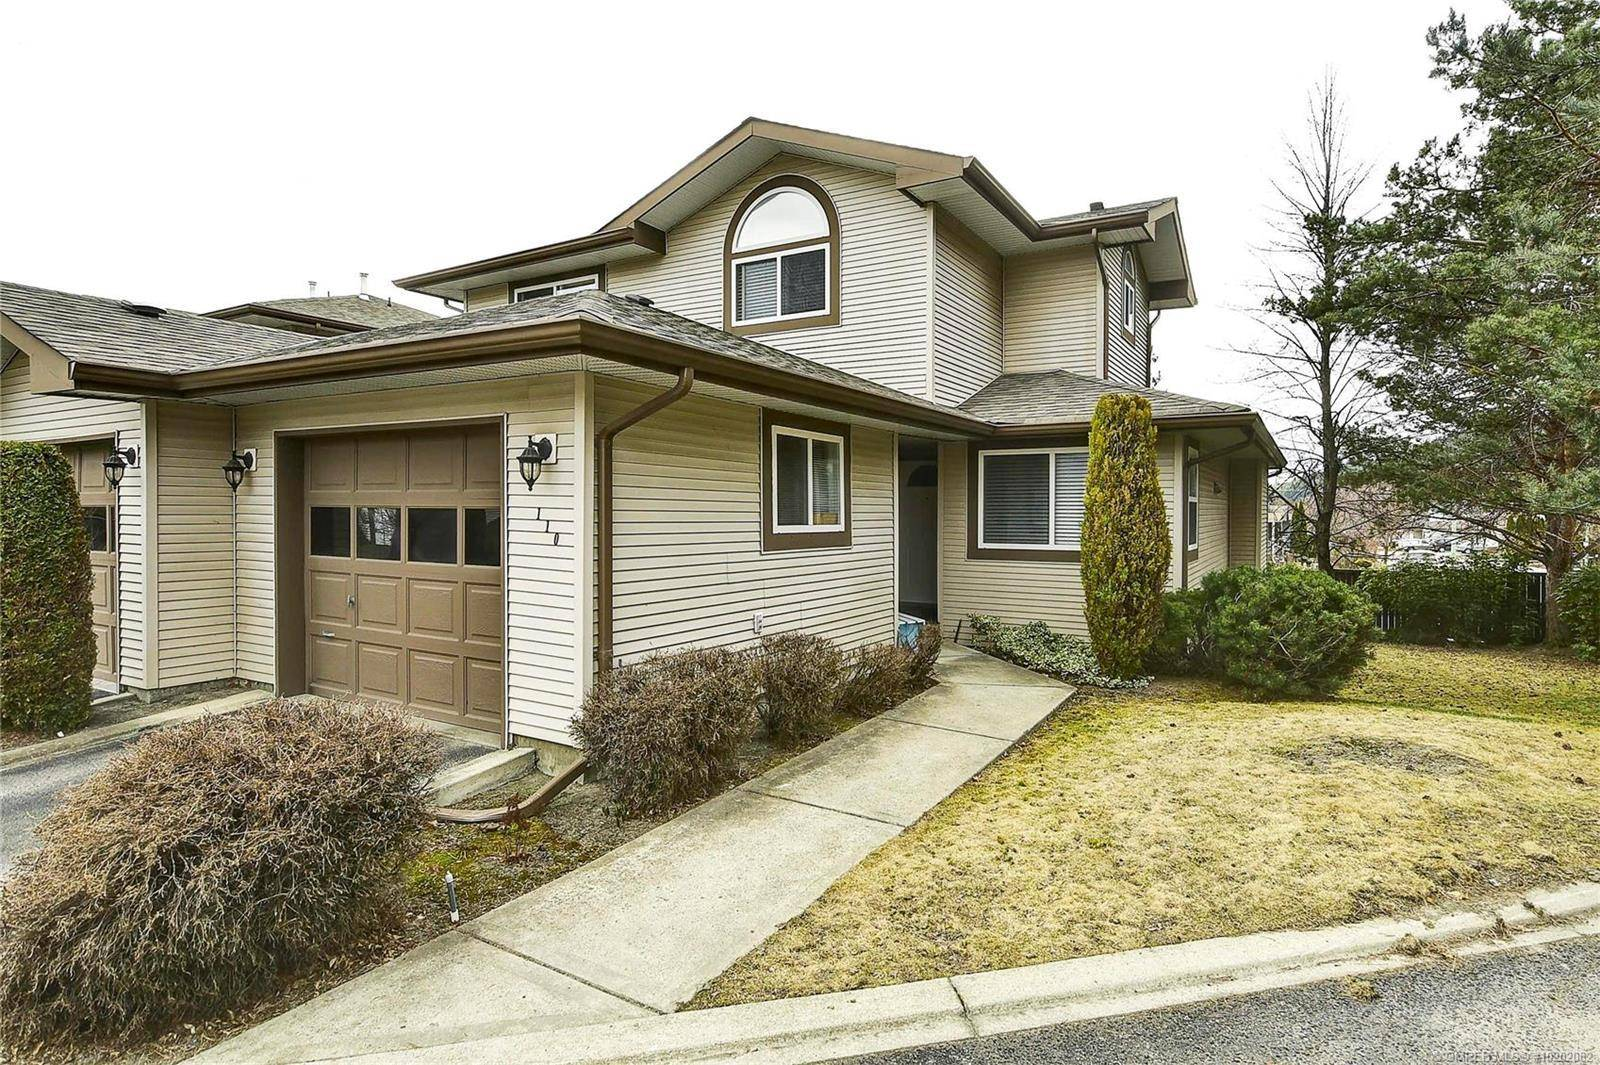 Townhouse for sale at 133 Wyndham Cres Unit 110 Kelowna British Columbia - MLS: 10202082